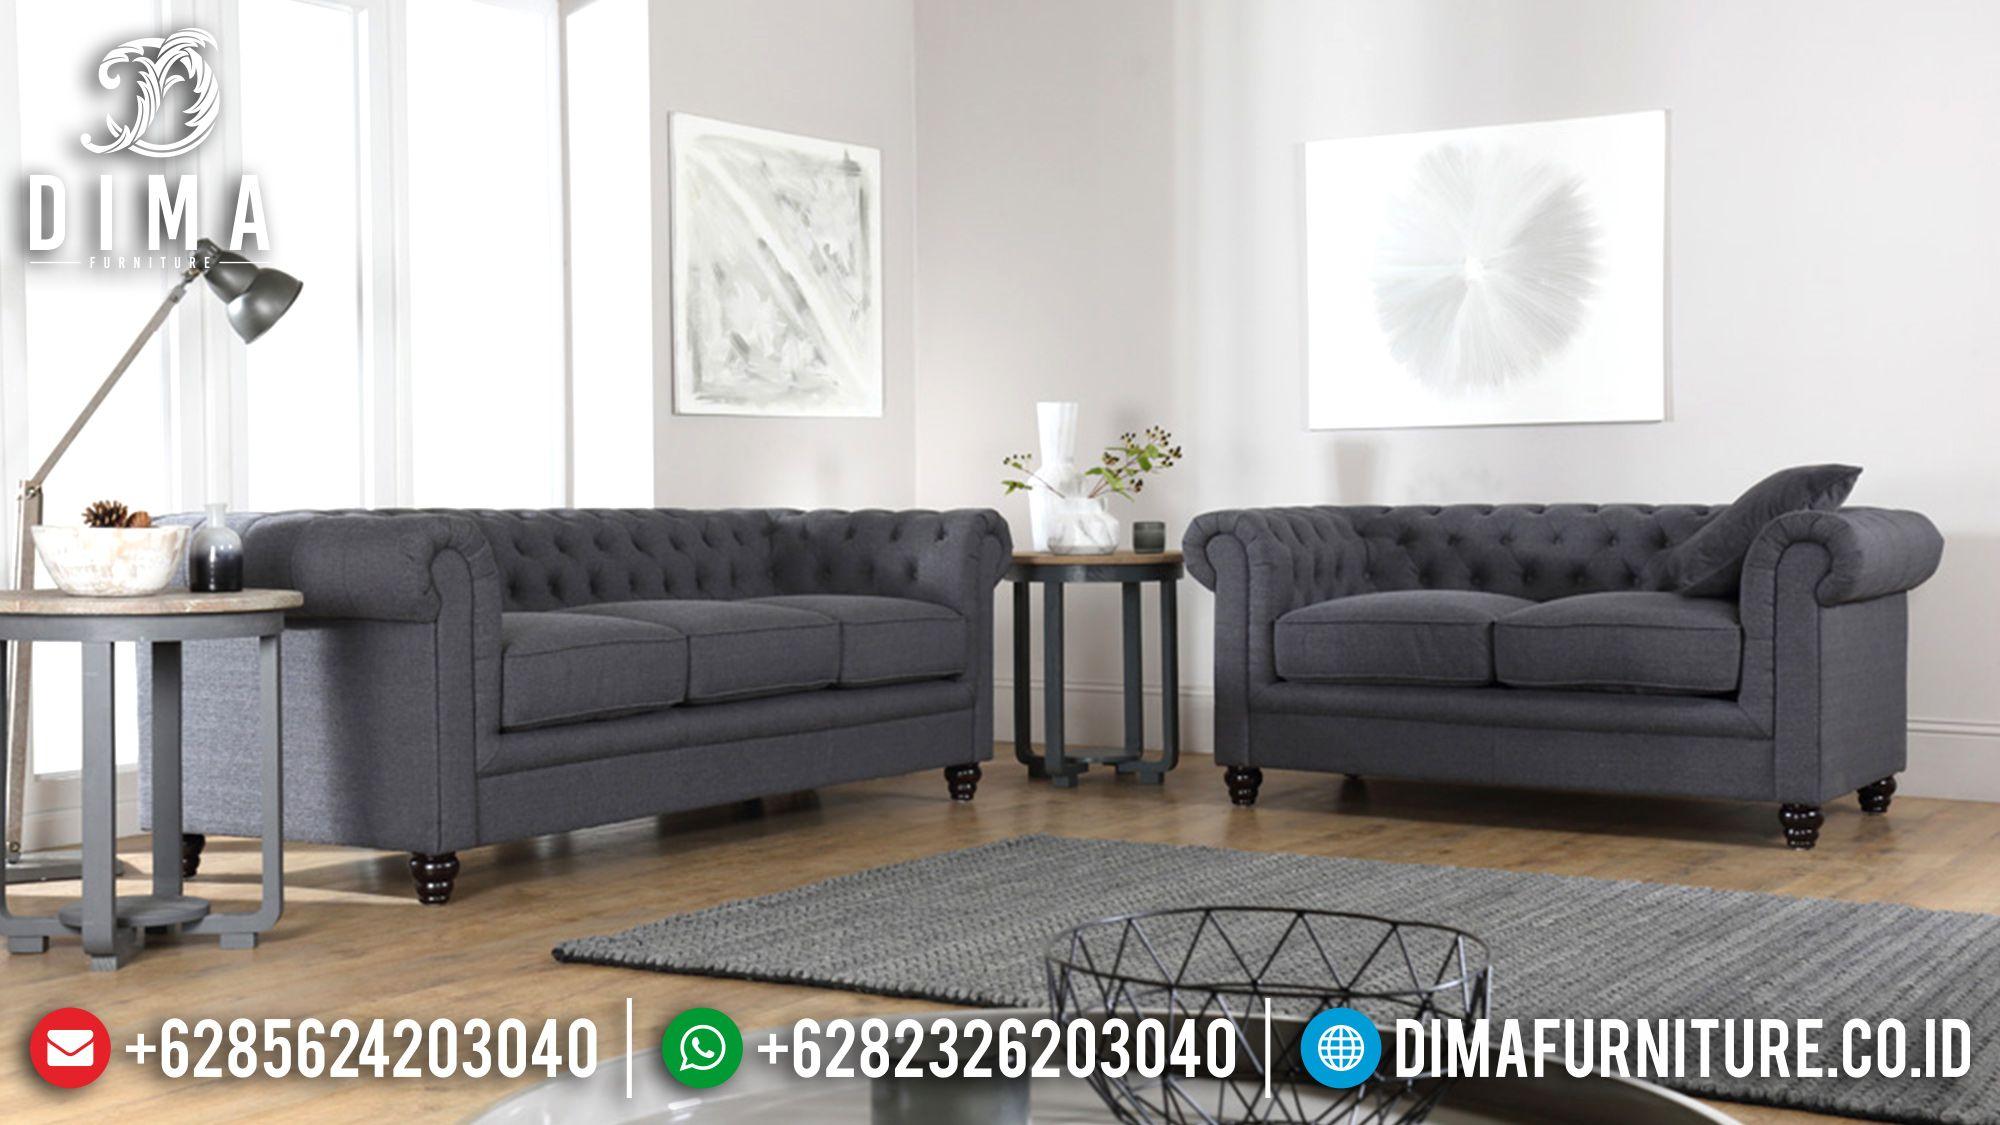 Set Sofa Tamu Minimalis Mewah Jepara Fabric Canvas Terbaru 2018 ST